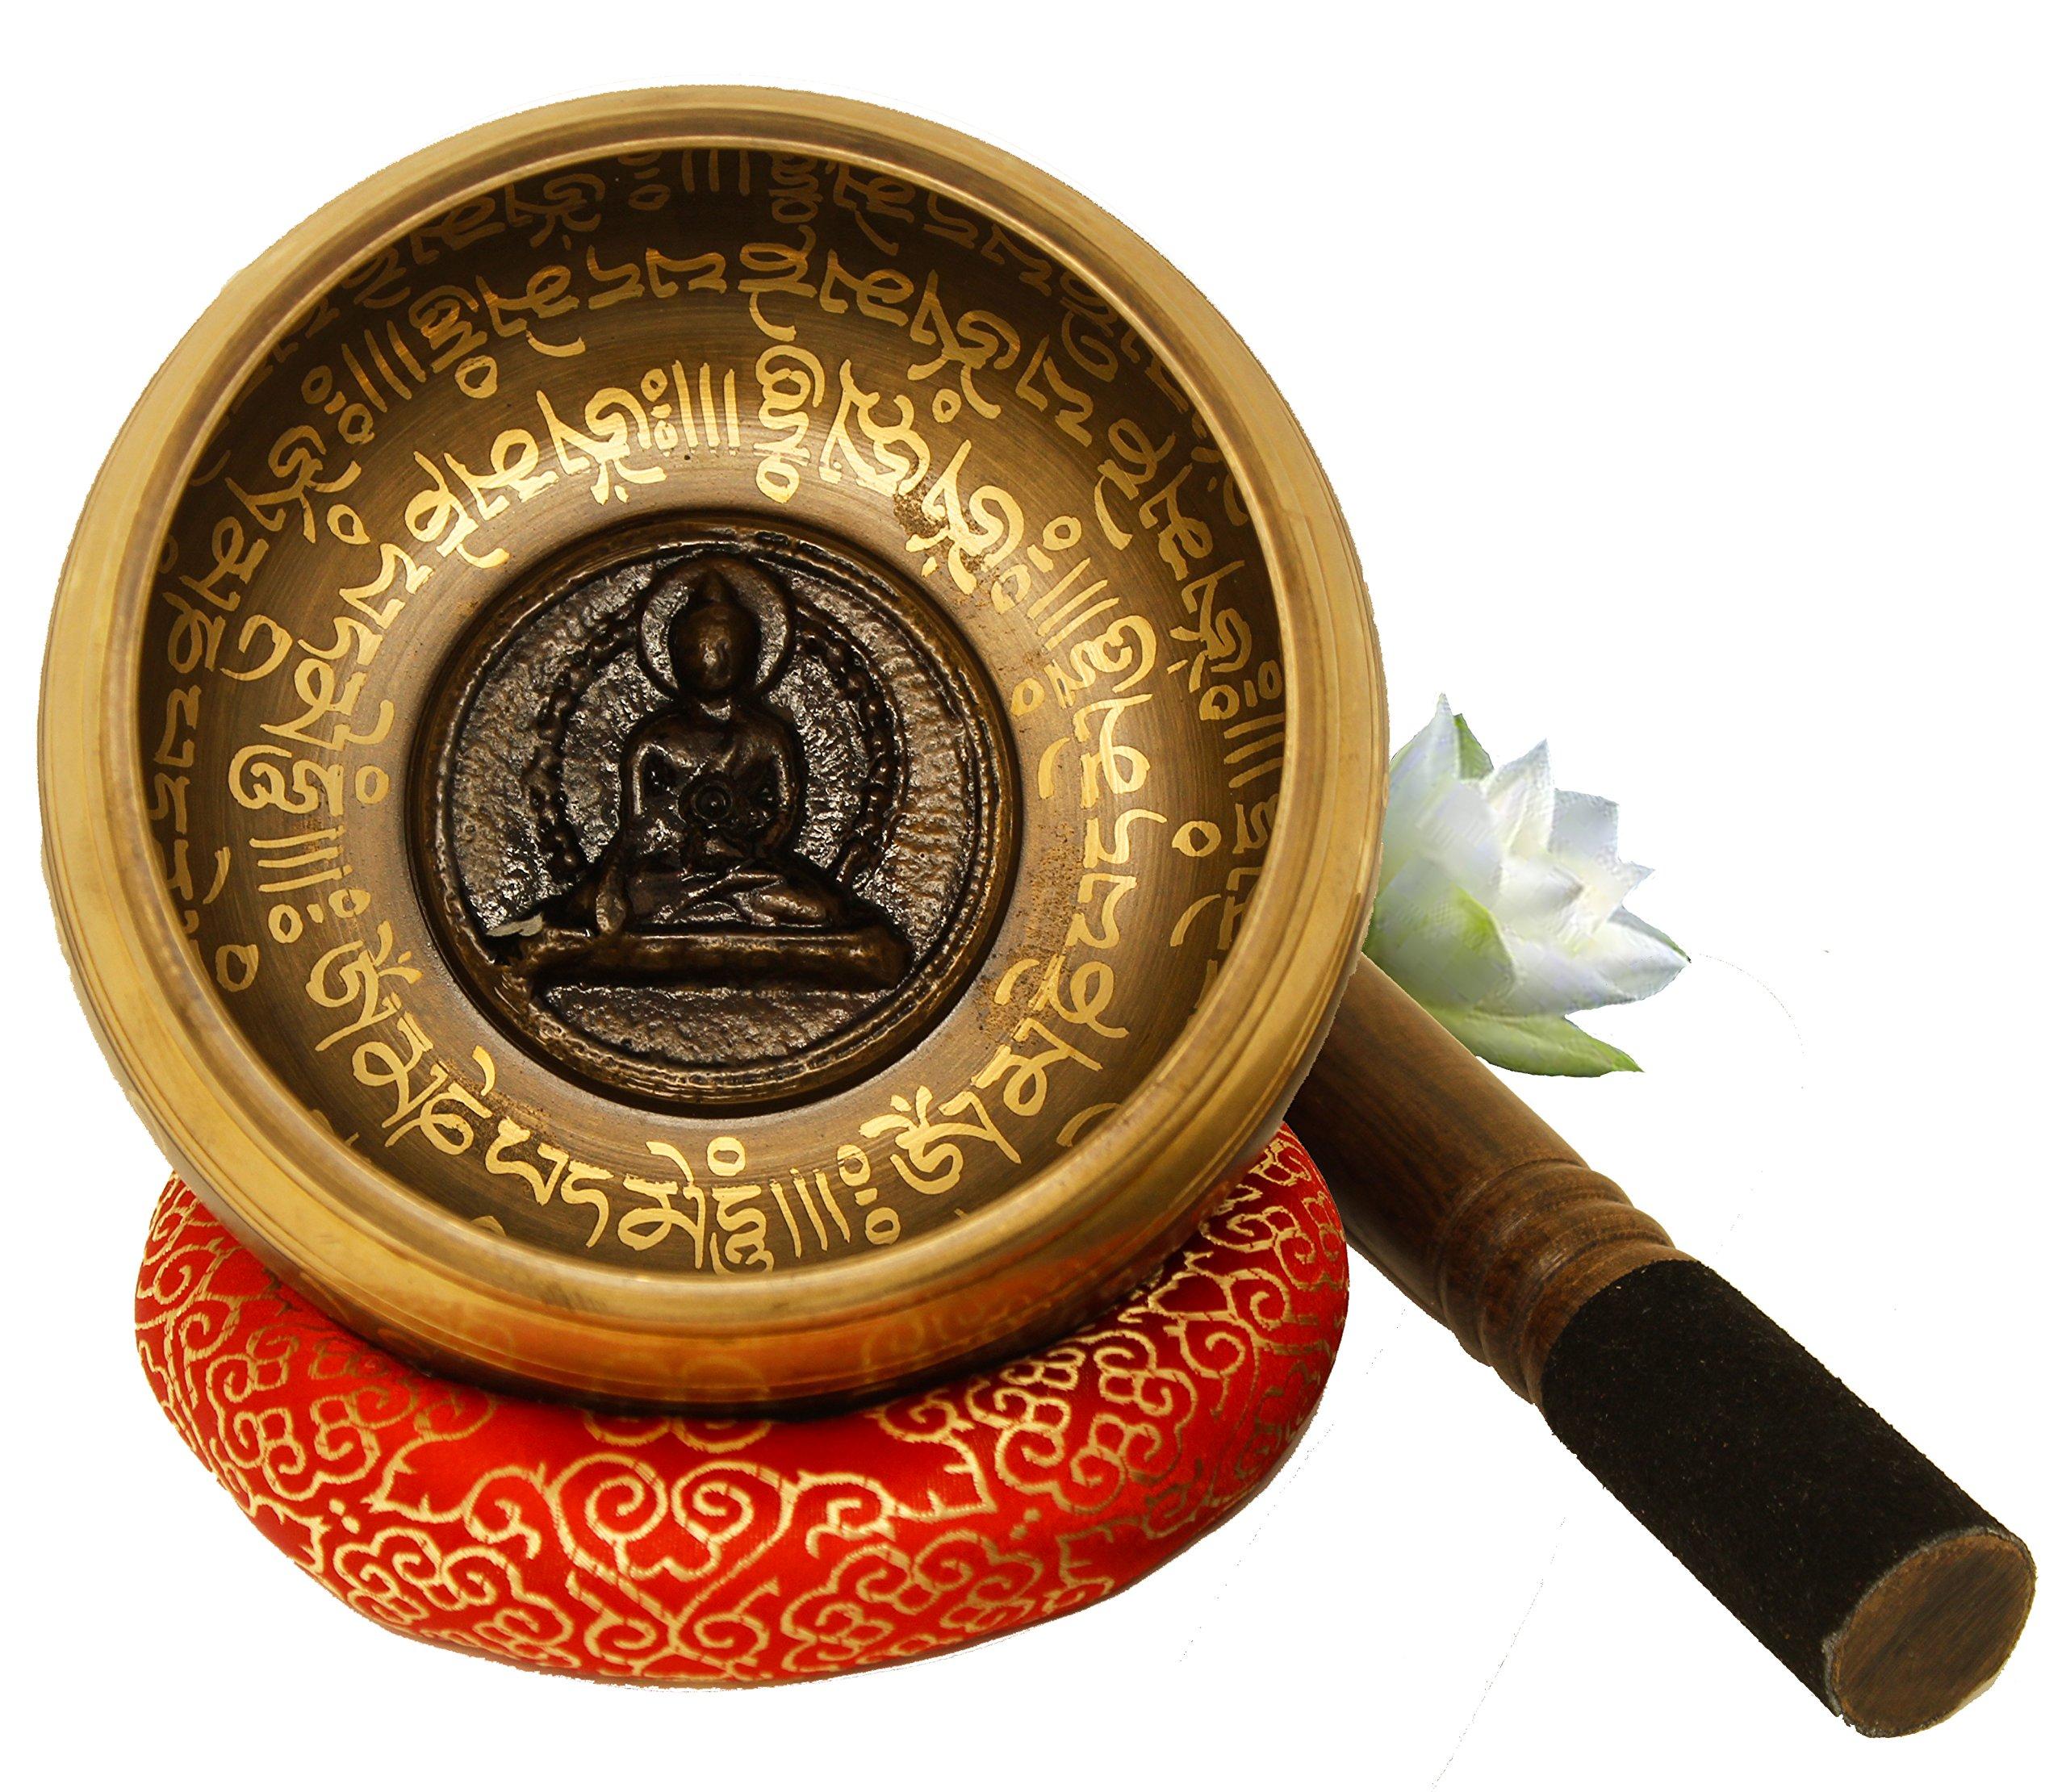 Large Tibetan Singing Bowl Set-Meditation Symbols Printed 5'' Singing Bowl With Wooden Mallet & Cushion For Prayer/Meditation/Yoga/Chakra Healing/Mindfulness/Decoration (Gold) by Juccini